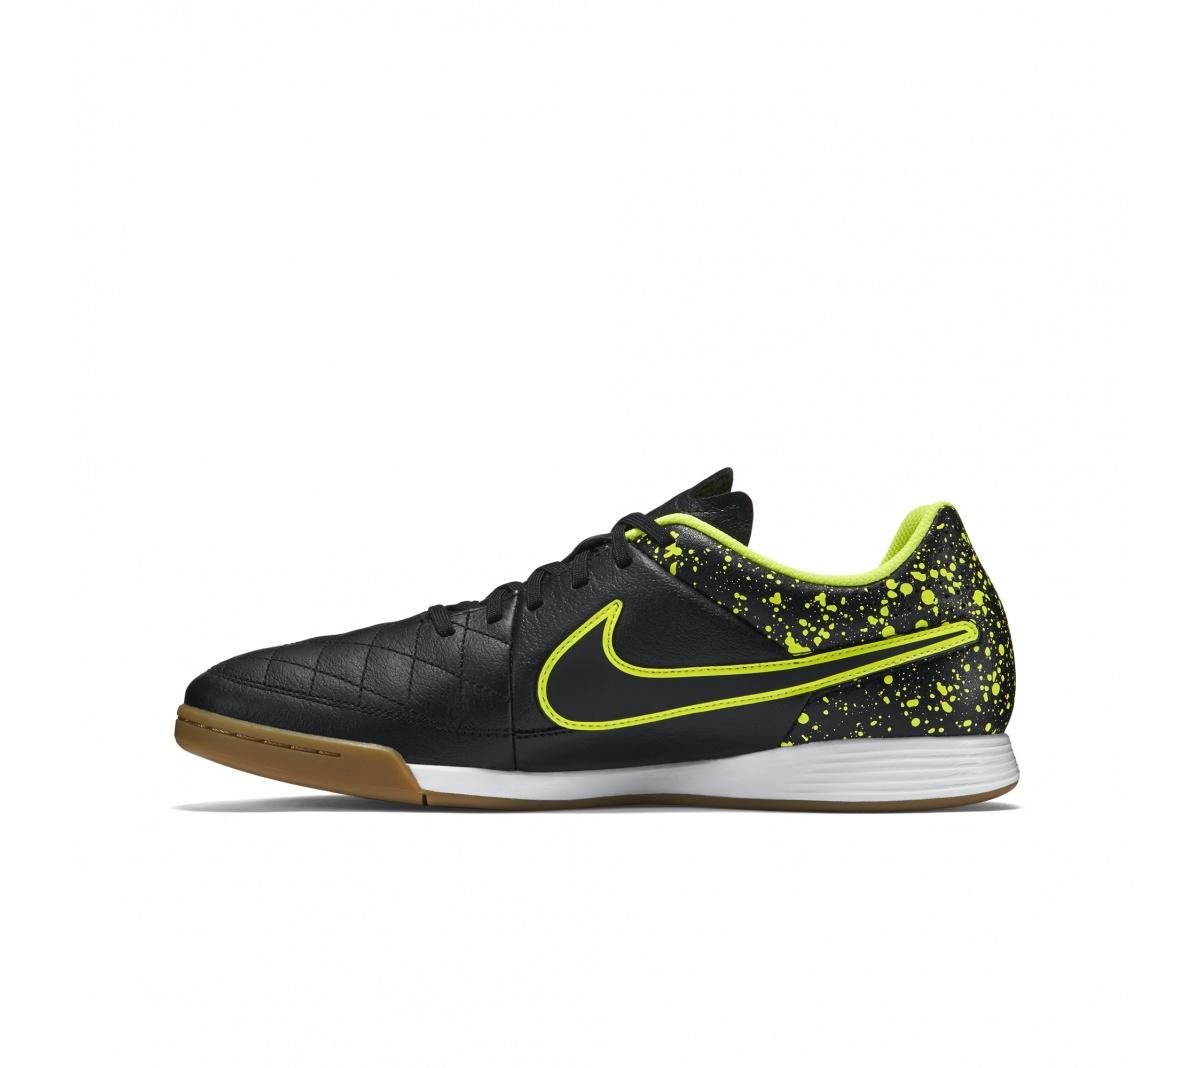 Tênis Nike Tiempo Genio Leather Futsal - Mundo do Futebol ed8d43eb91192